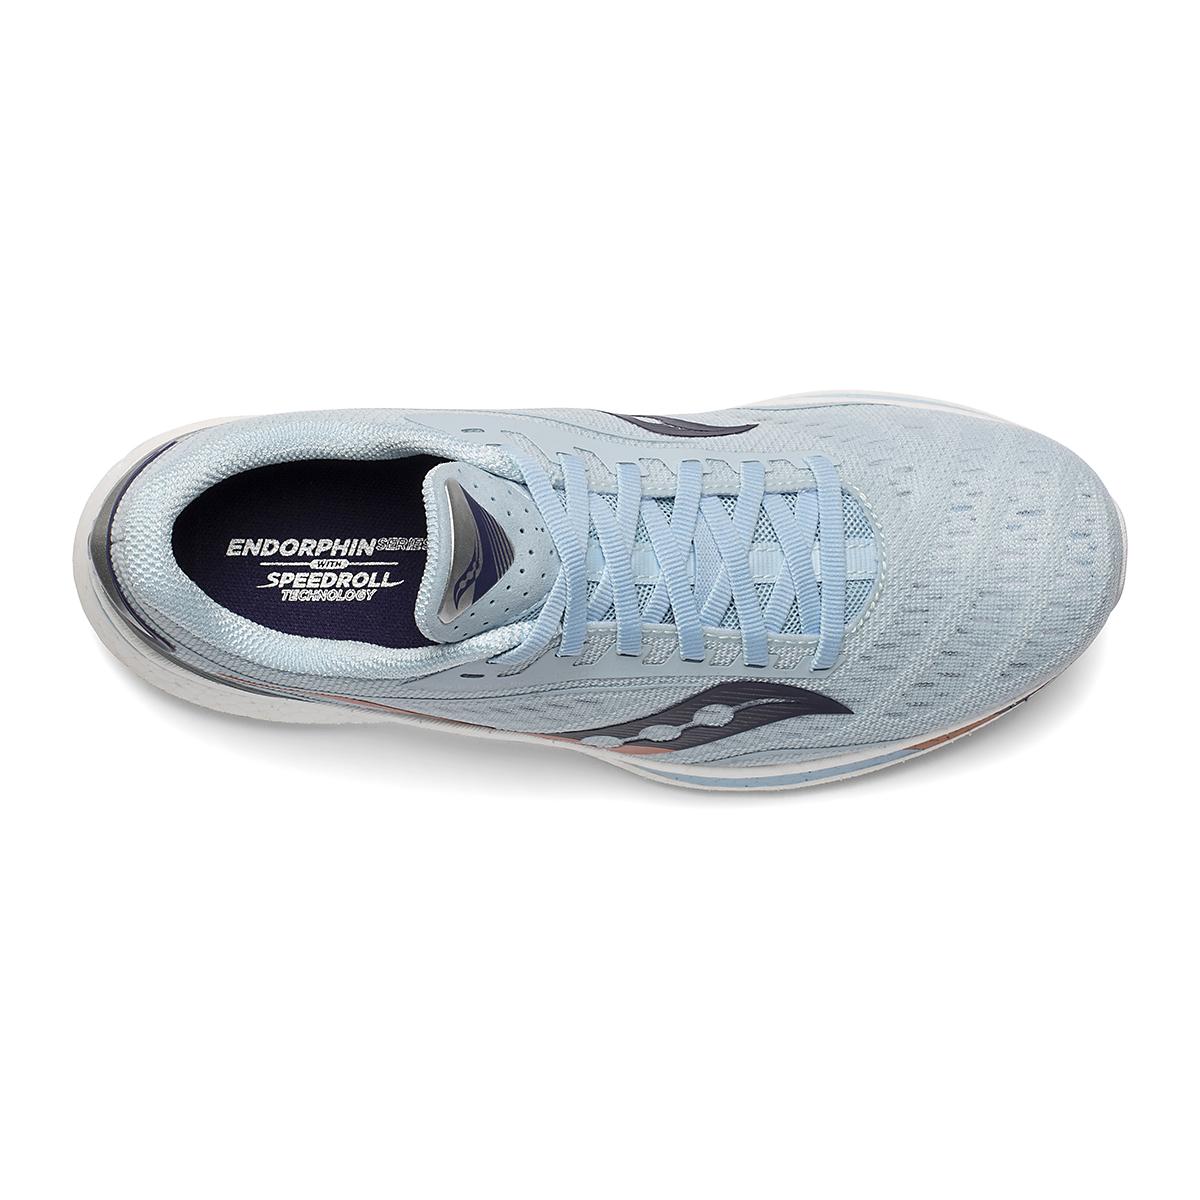 Women's Saucony Endorphin Speed Running Shoe - Color: Sky/Midnight - Size: 8.5 - Width: Regular, Sky/Midnight, large, image 3